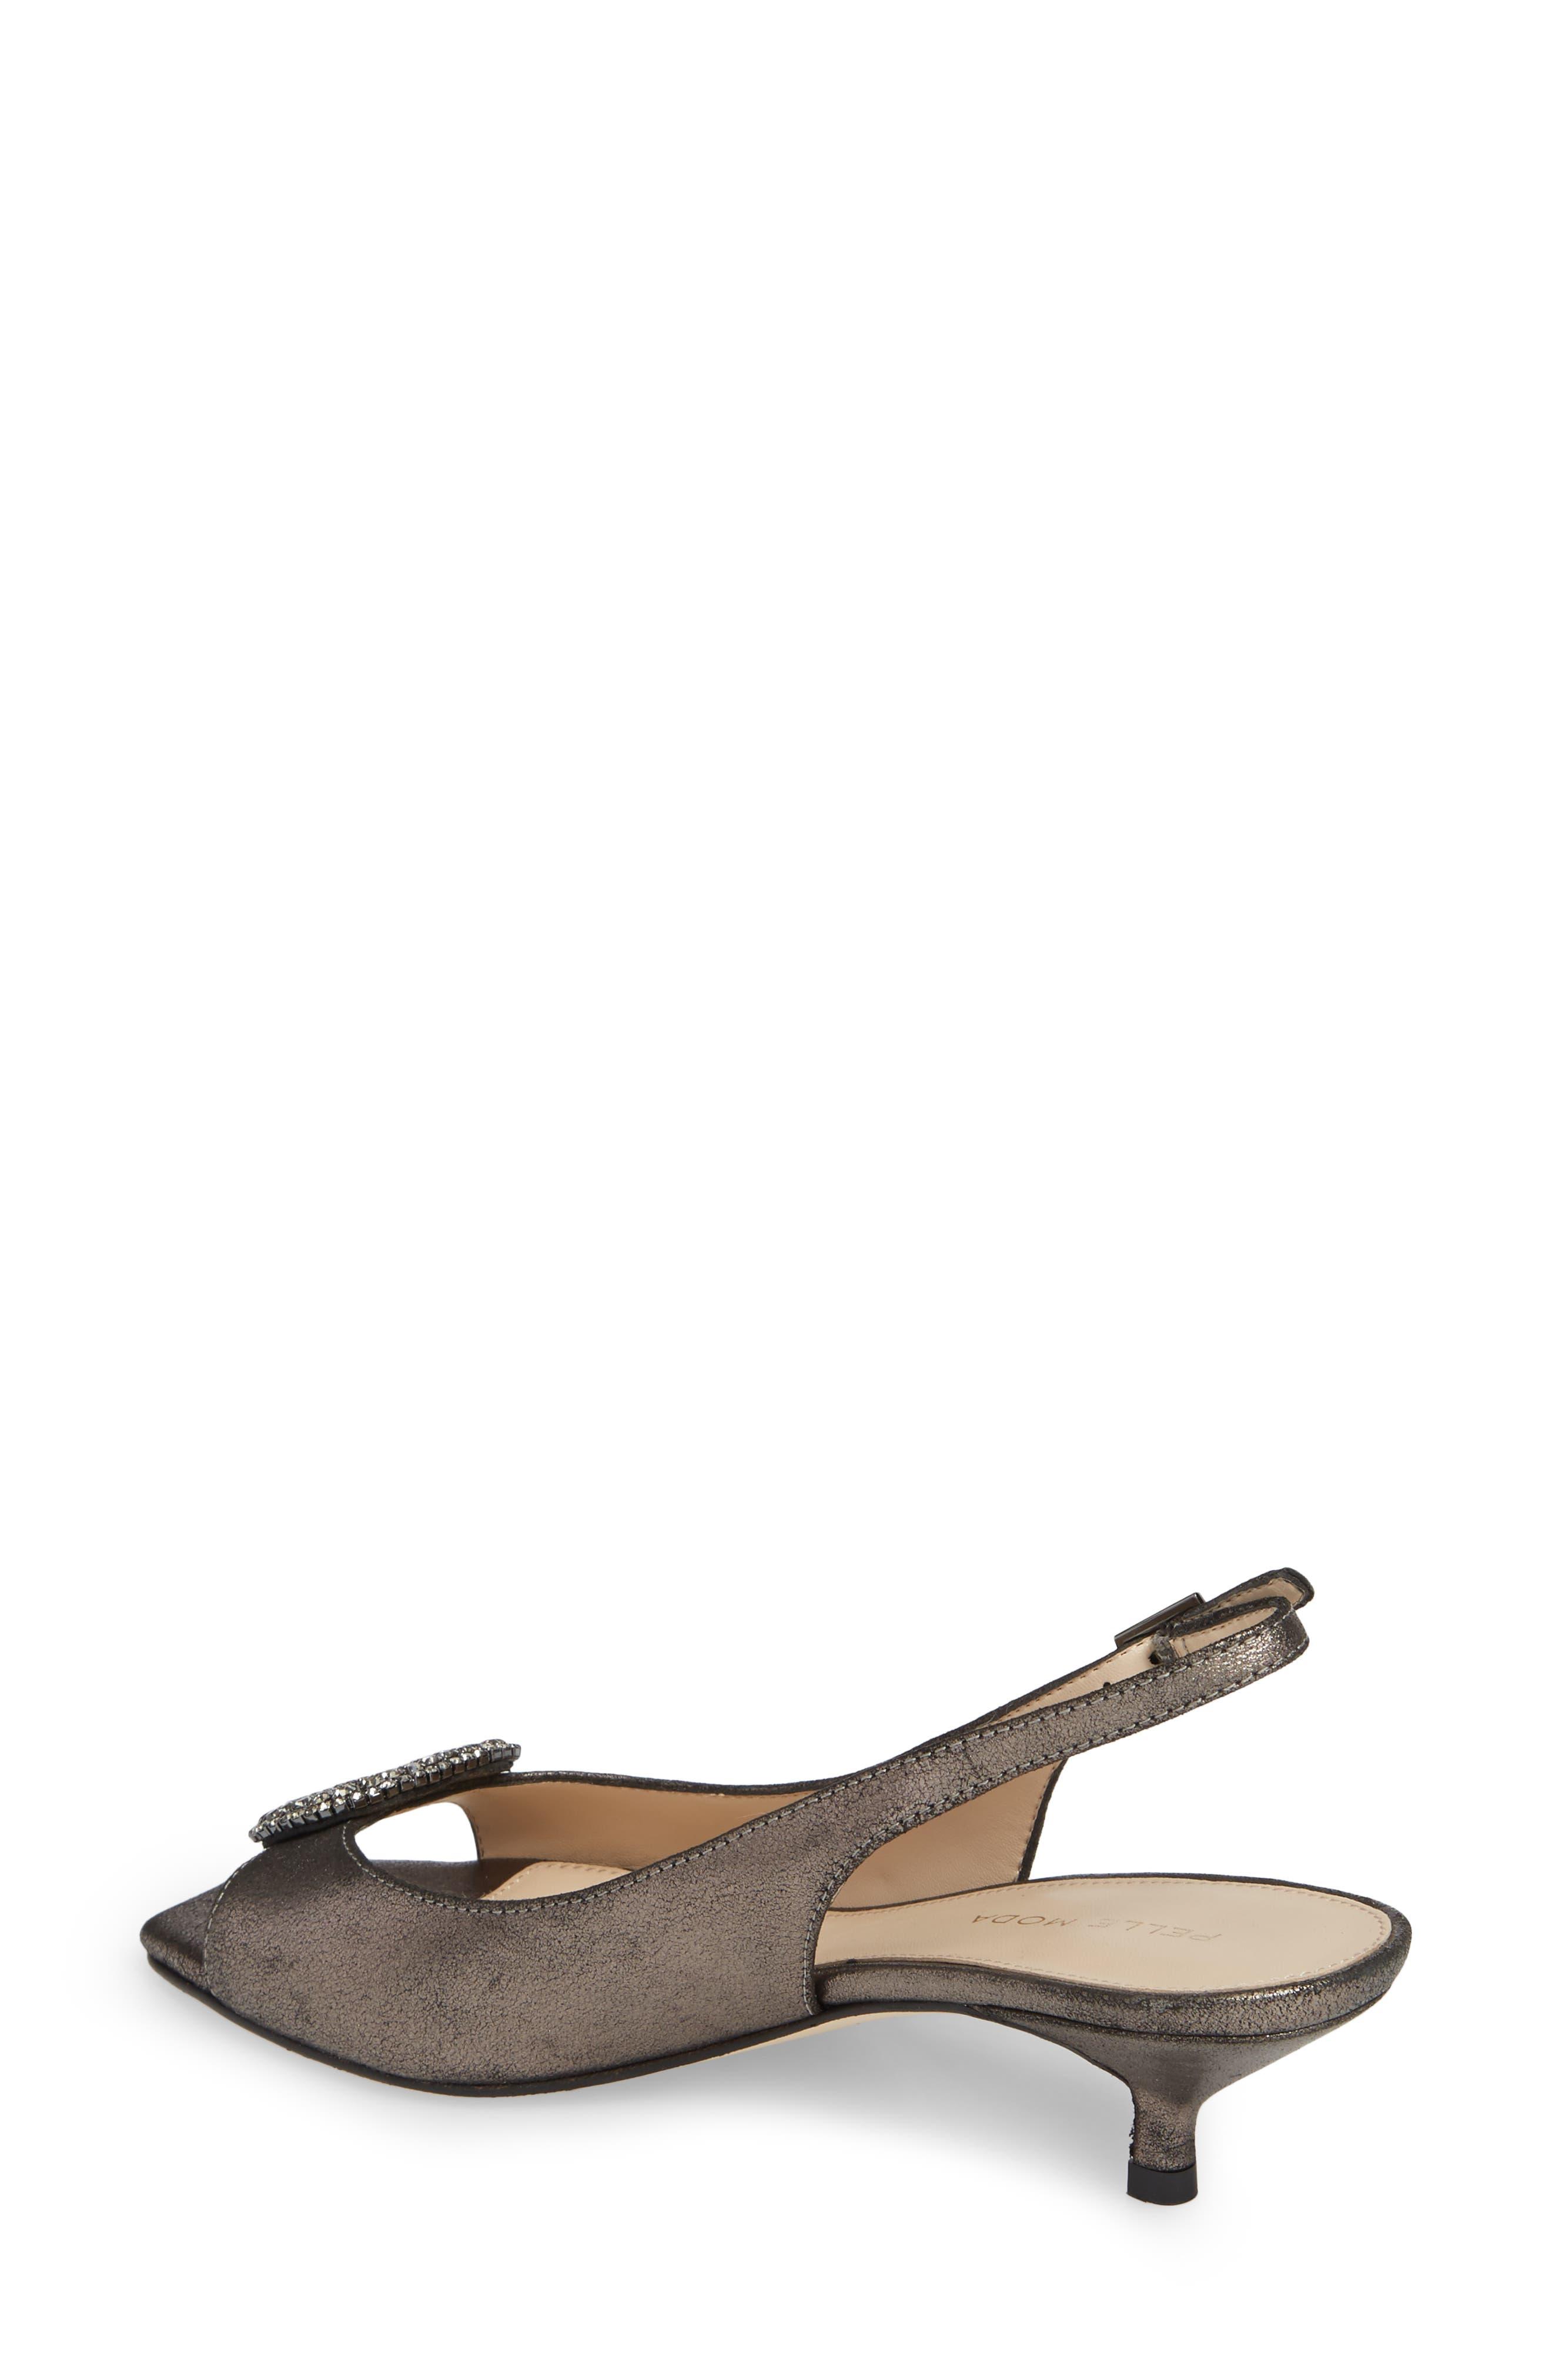 Fresca Slingback Sandal,                             Alternate thumbnail 2, color,                             PEWTER METALLIC SUEDE